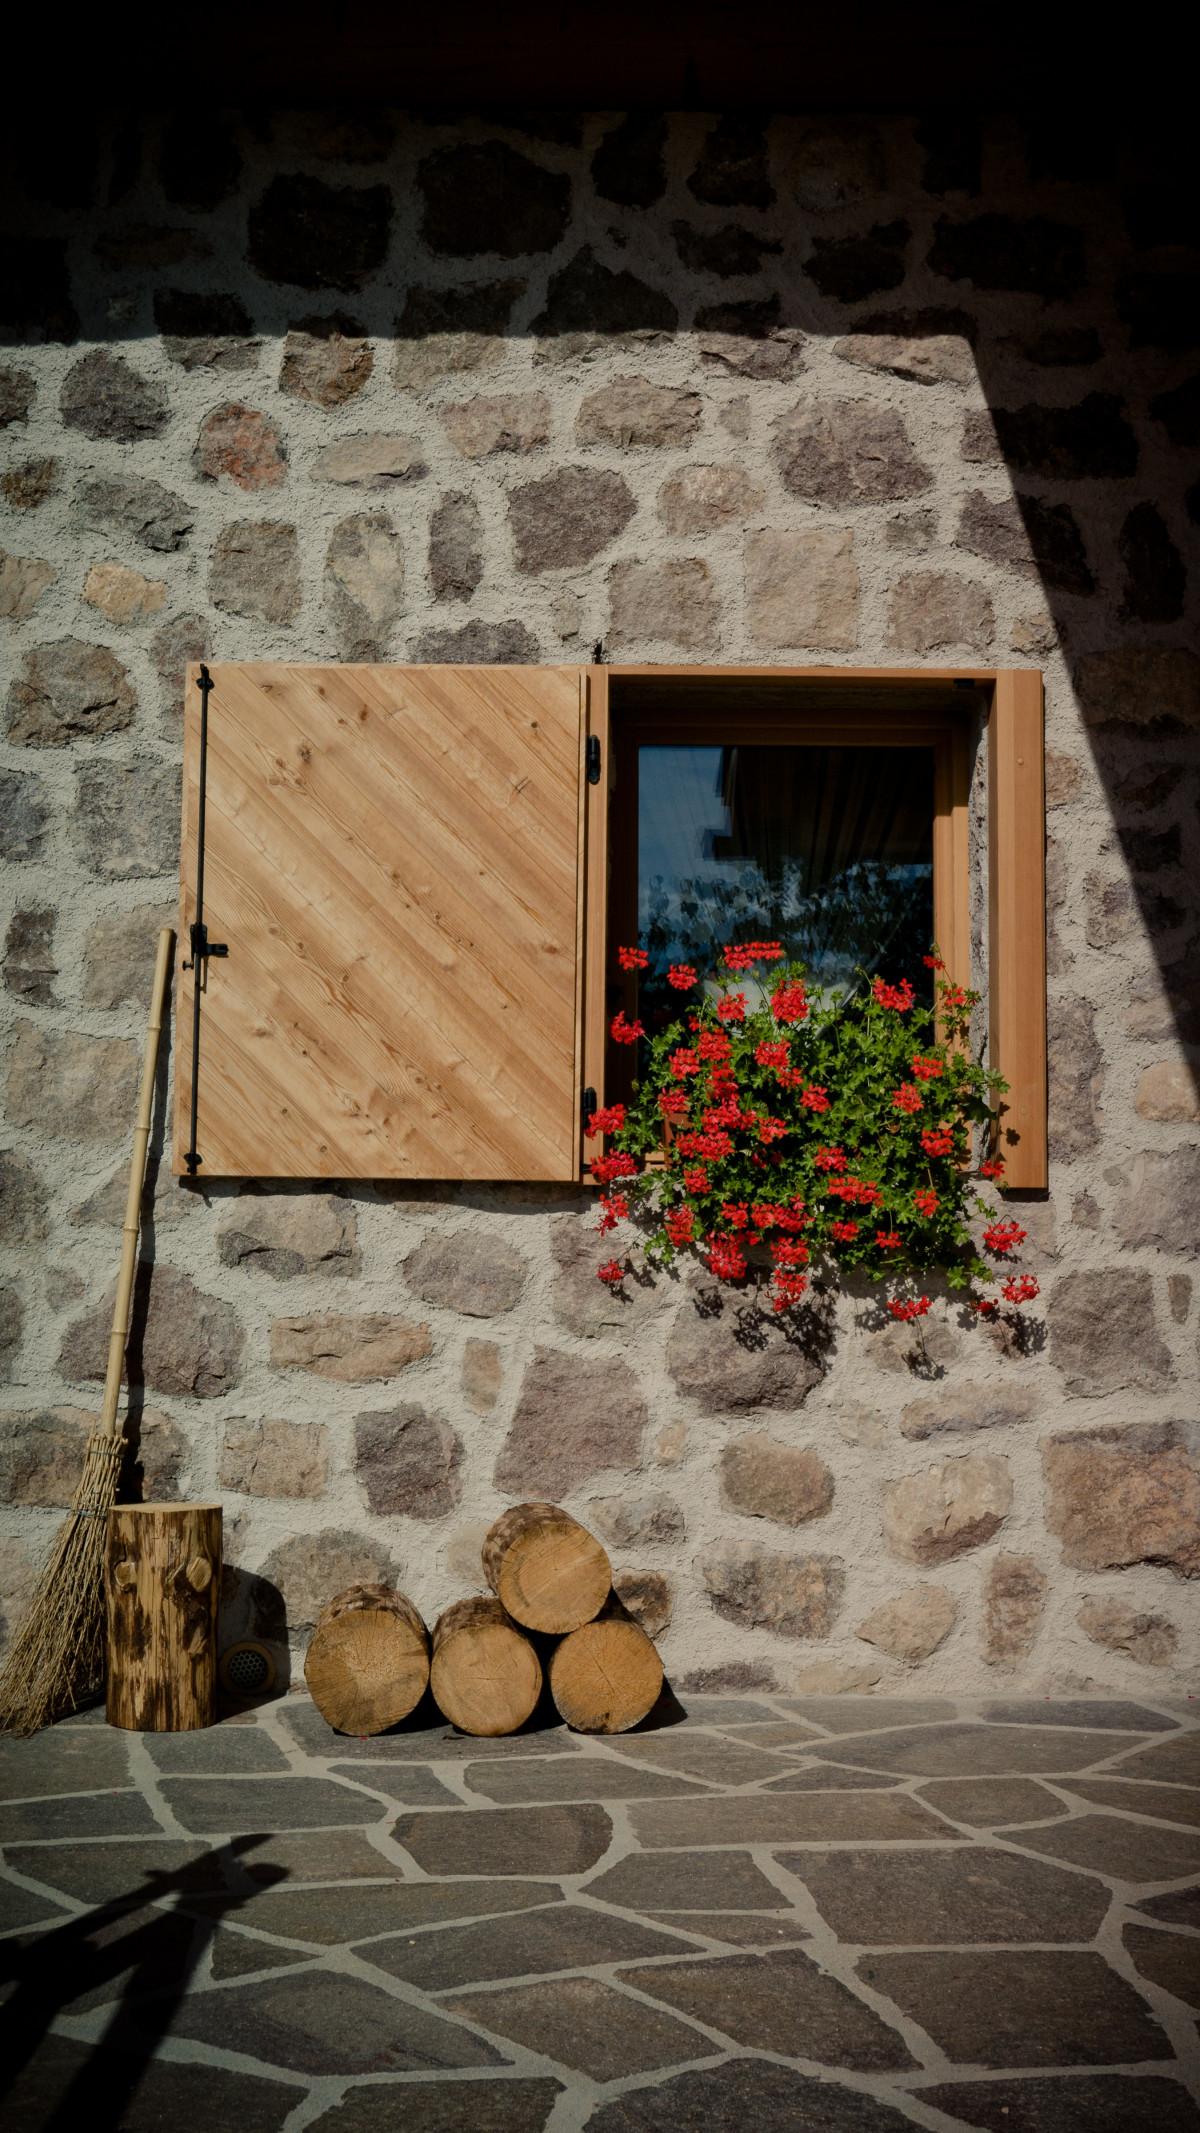 Fotos gratis madera casa piso ventana pared r stico for Casas de ladrillo rustico